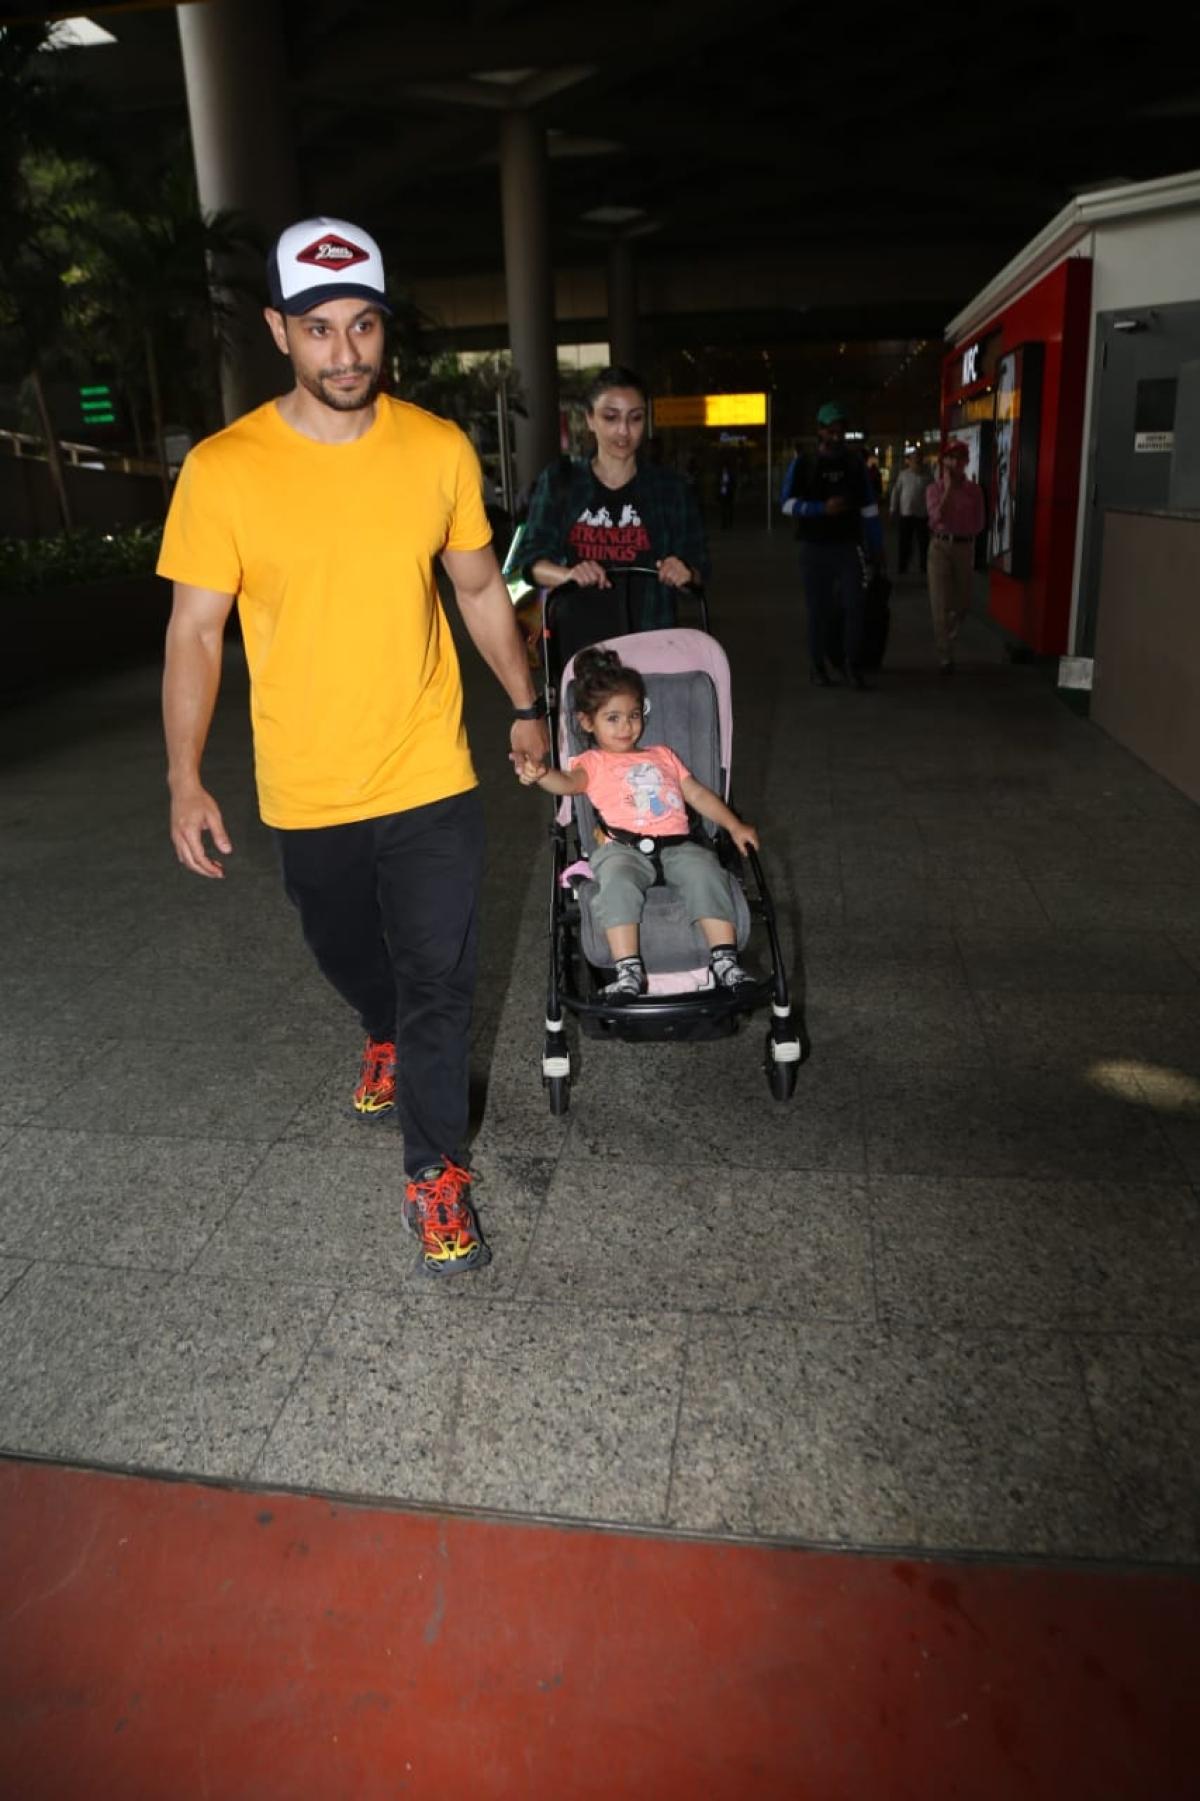 Watch video: Did Kunal Kemmu forget his daughter Inaaya is on a pram?